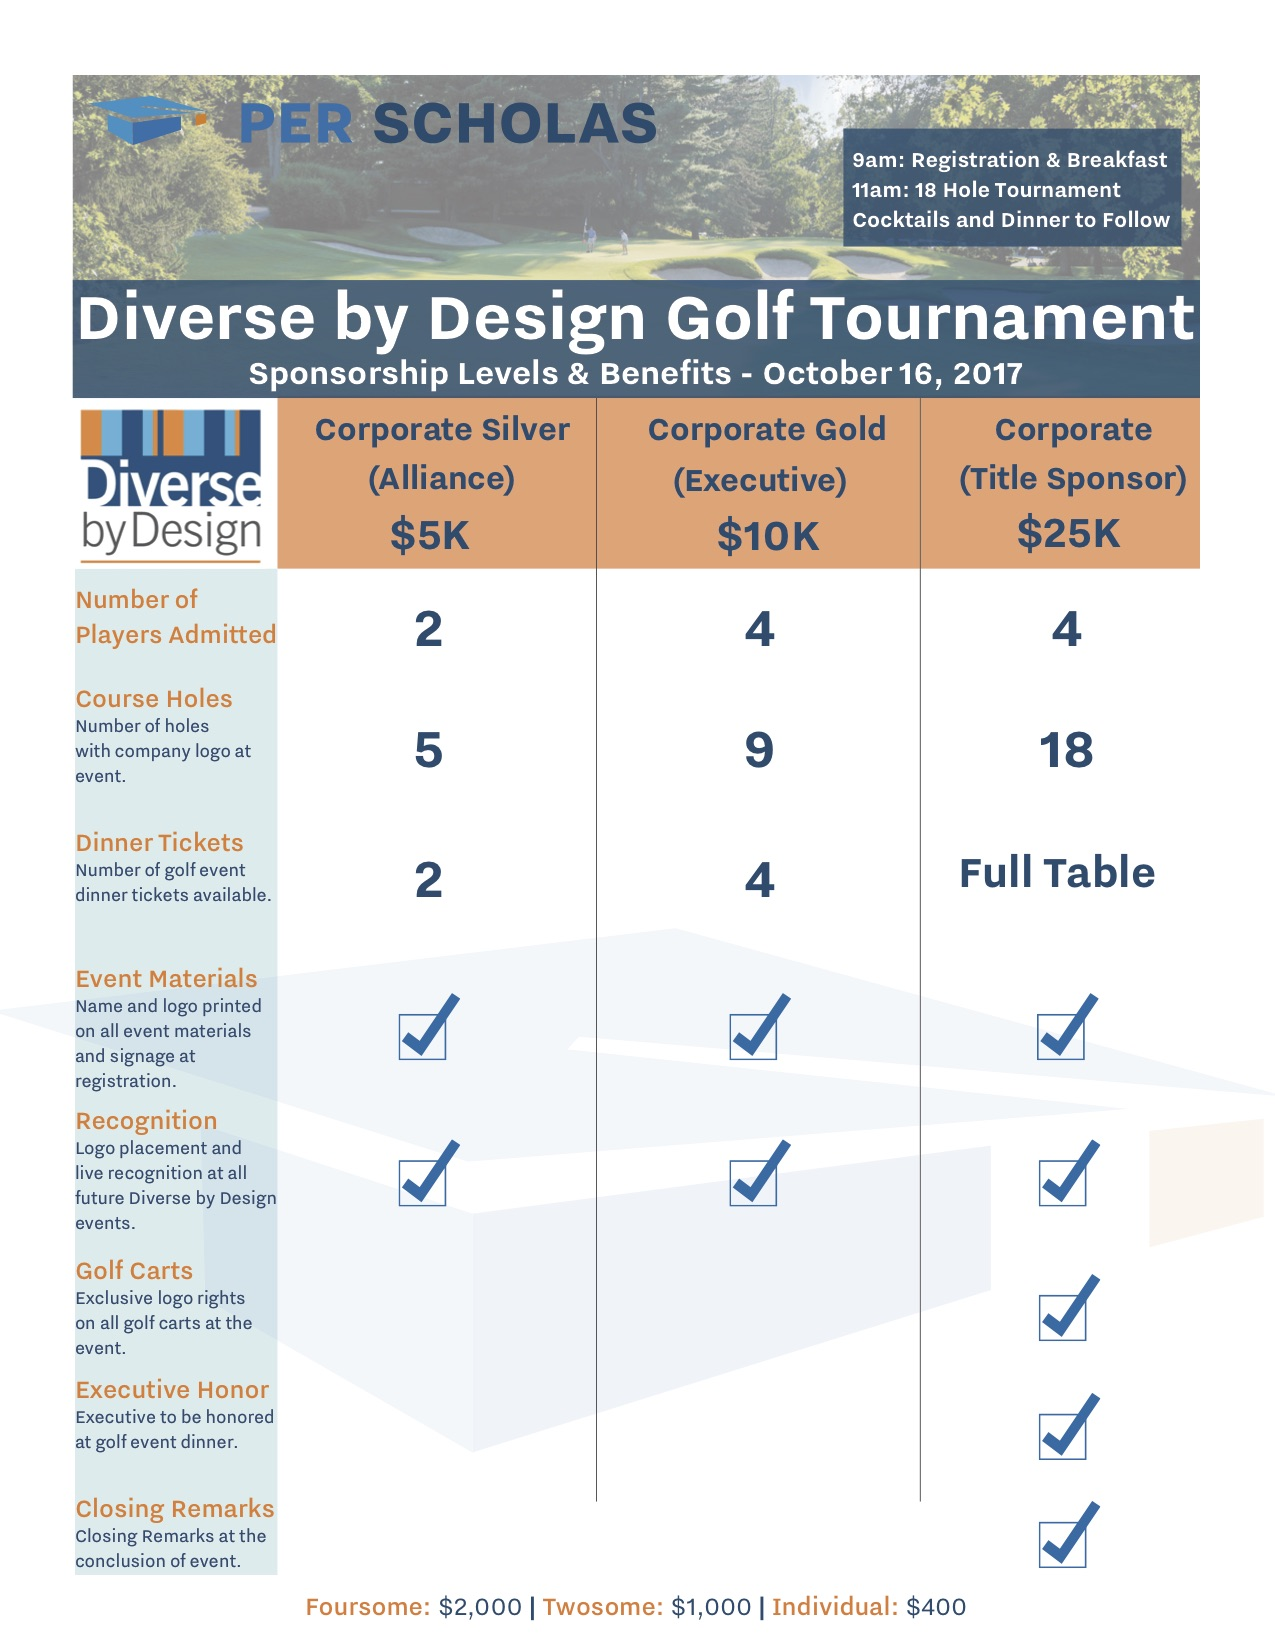 Diverse by Design Golf Sponsorship Chart_chl_6_21 (1) (1) 2.jpg